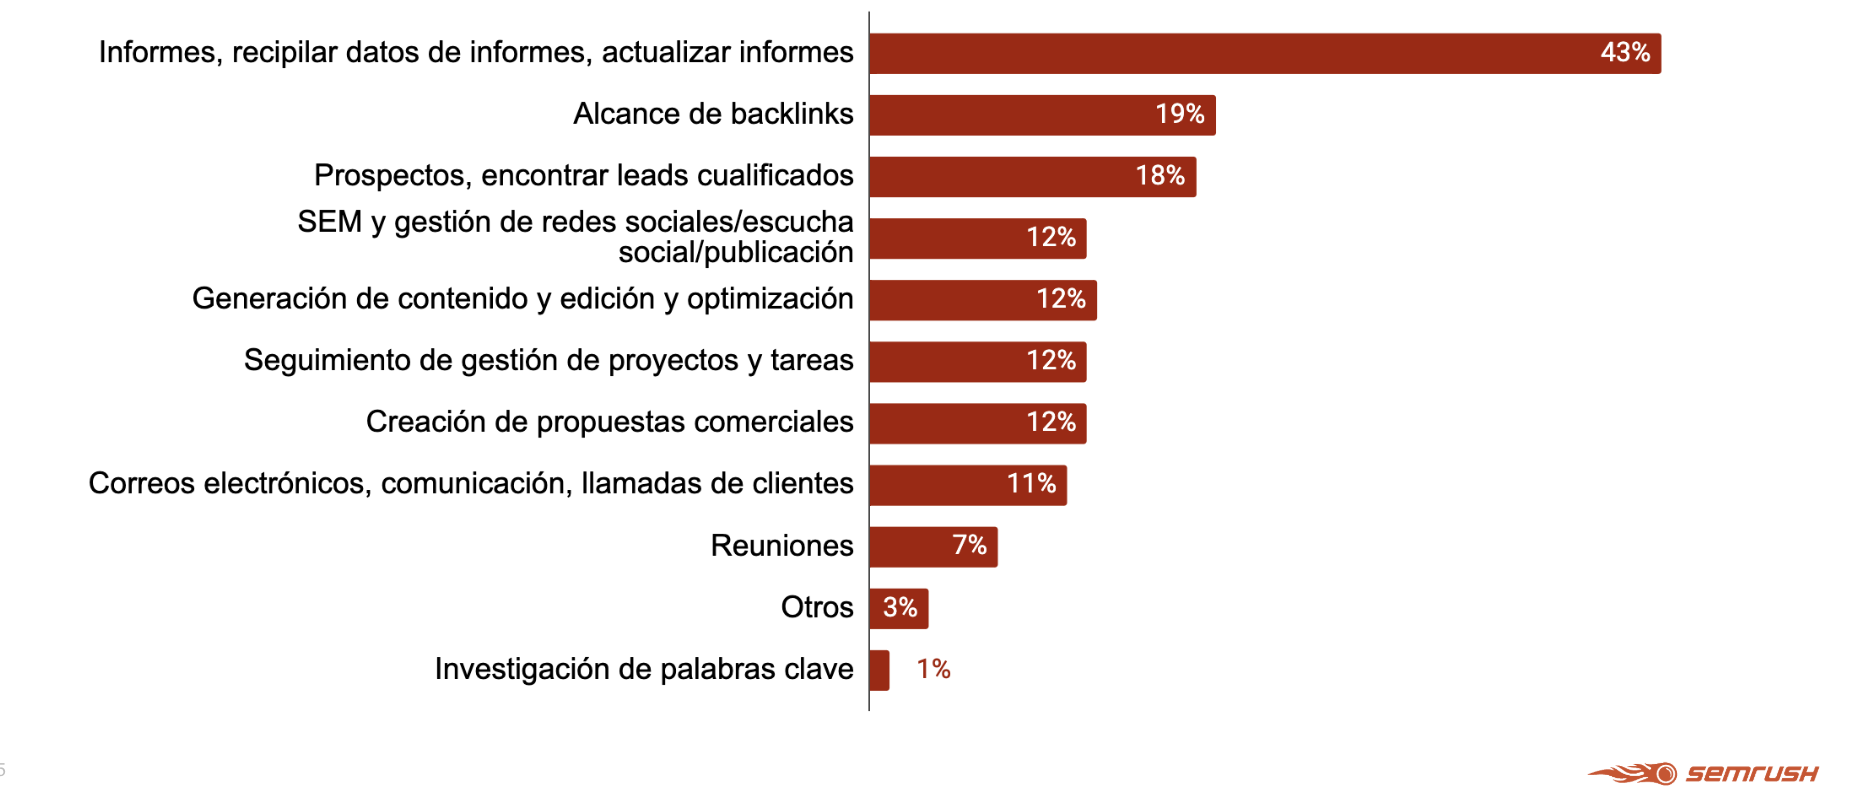 Informes de marketing - Principales tareas a automatizar